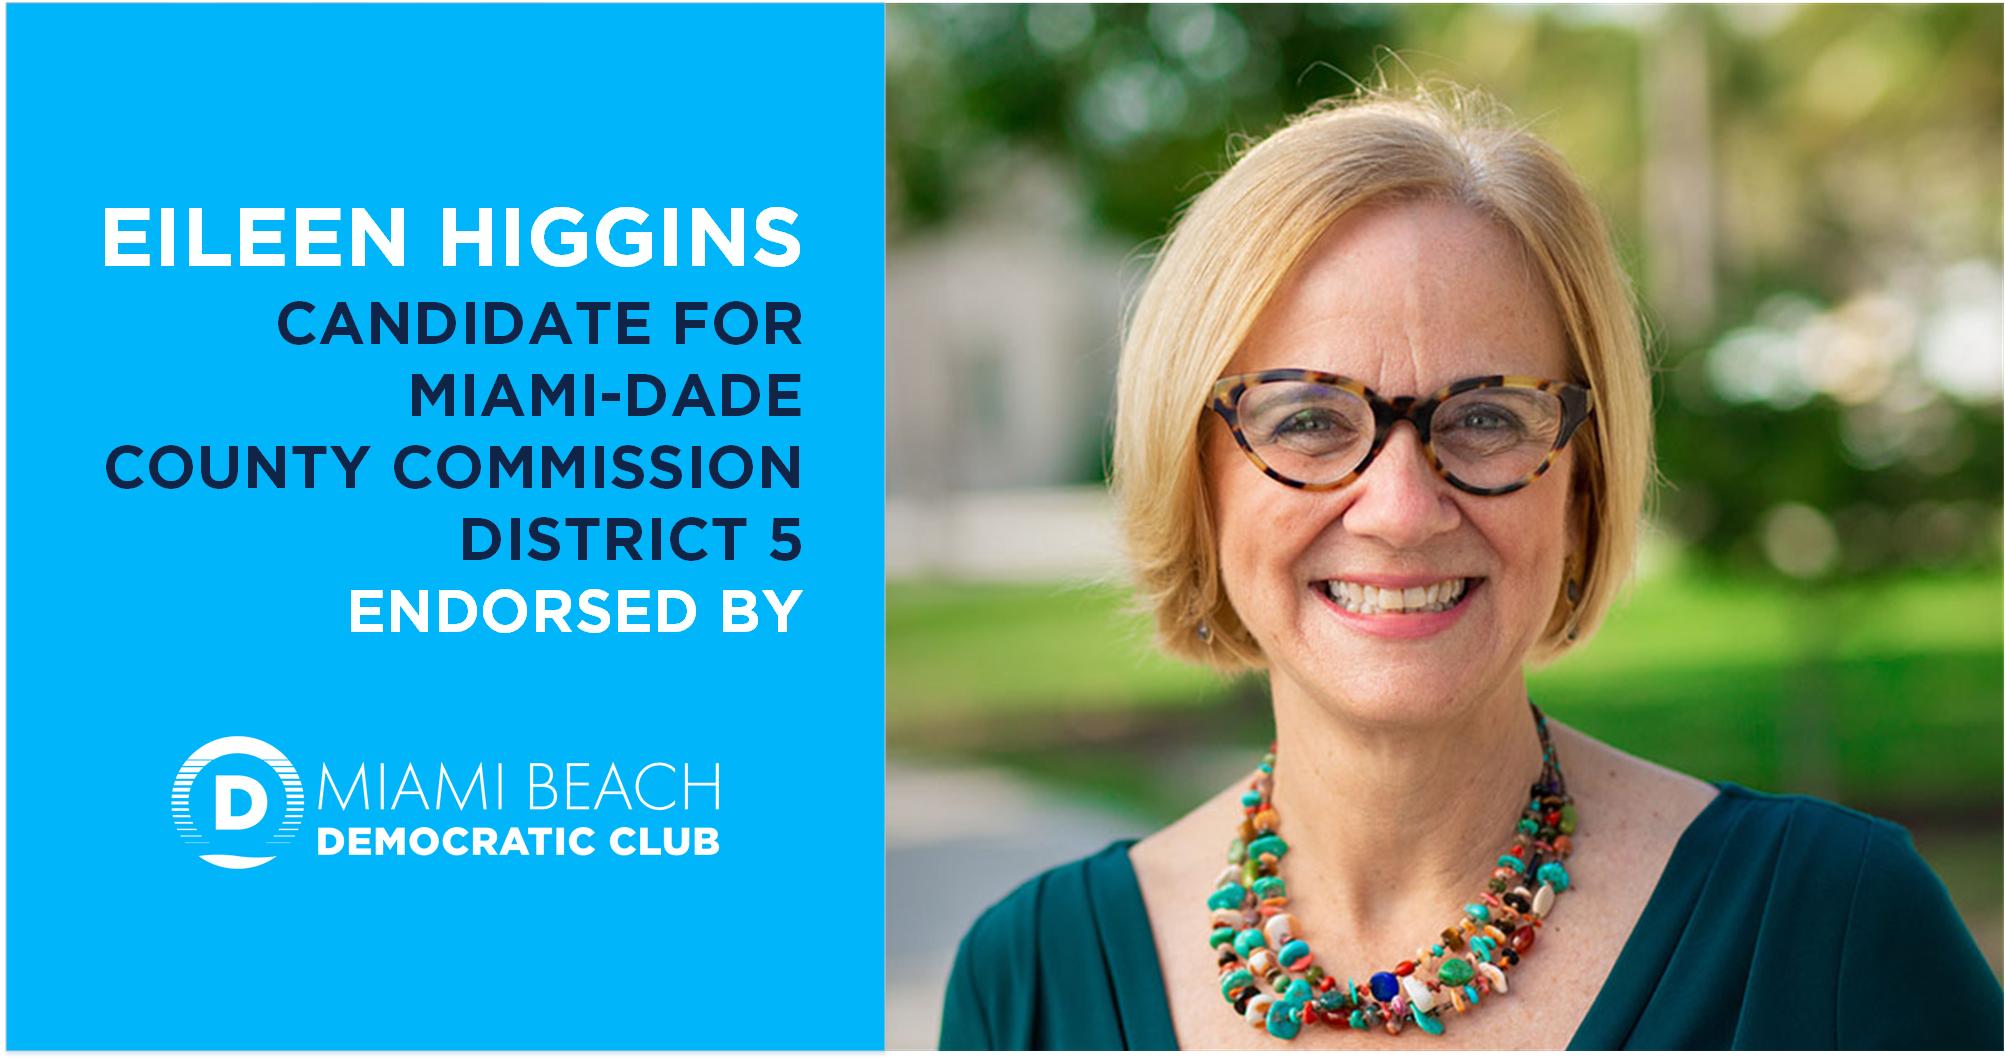 MBDC Eileen Higgins Endorsement